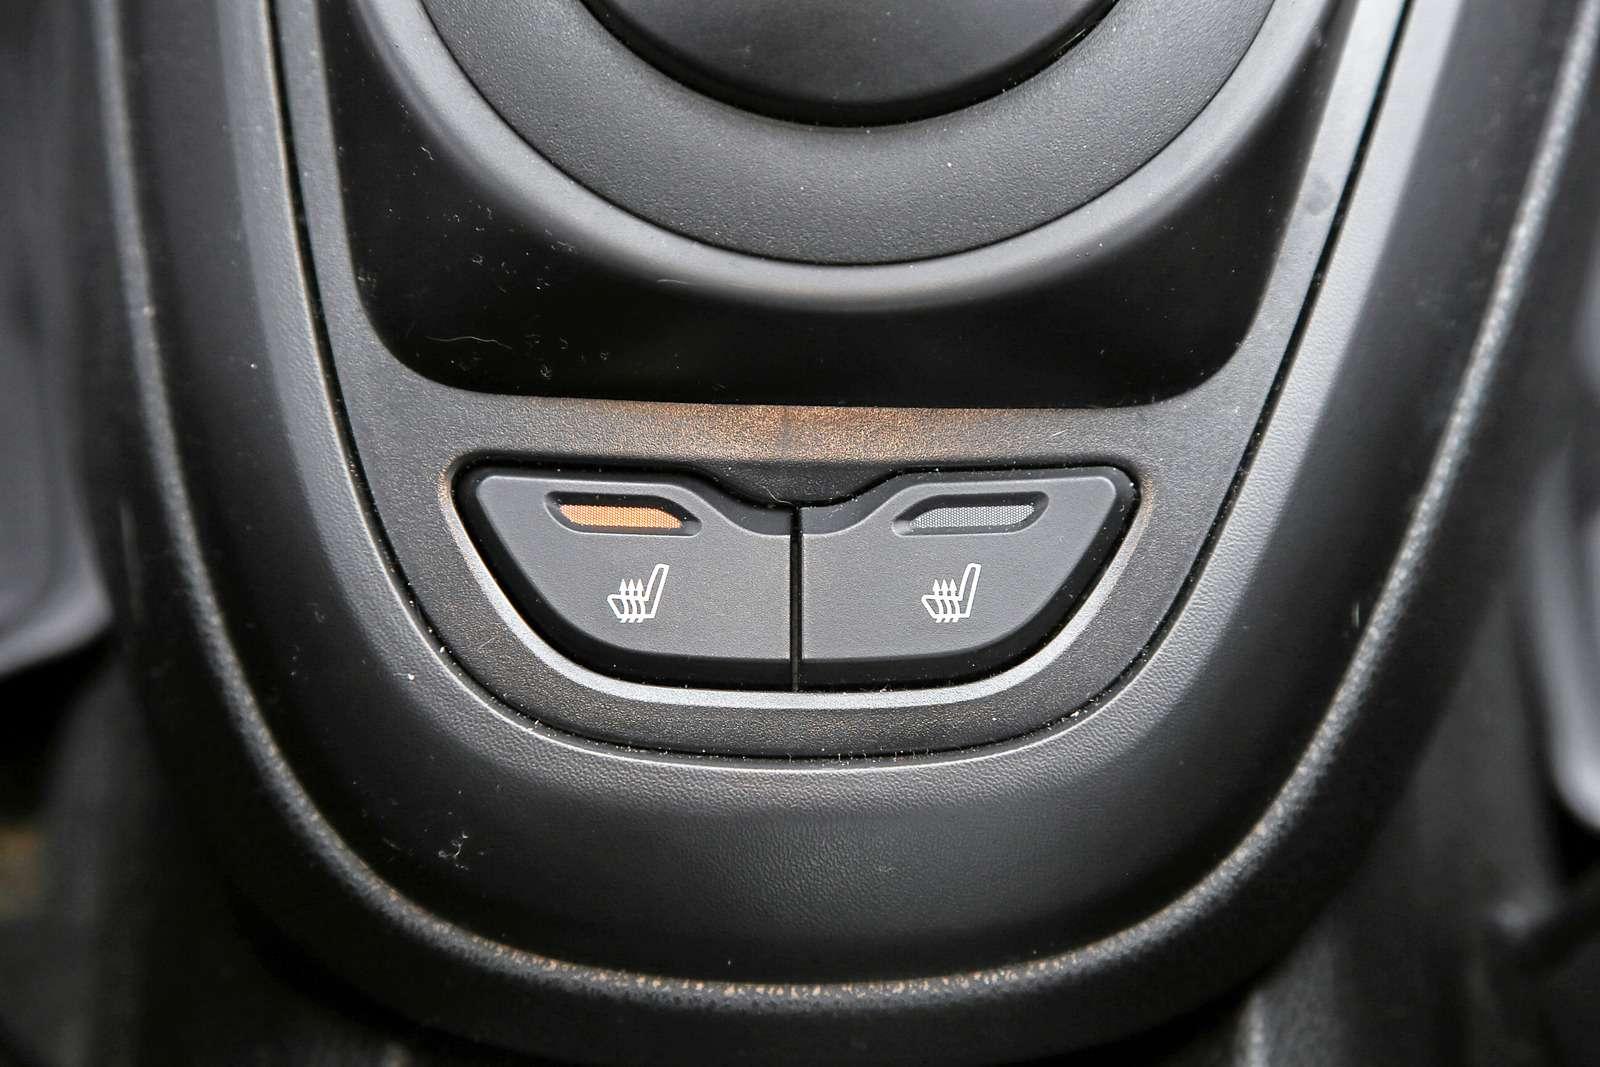 Большой зимний тест: Lada Vesta, Lada XRAY иDatsun mi-DO изпарка ЗР— фото 571439